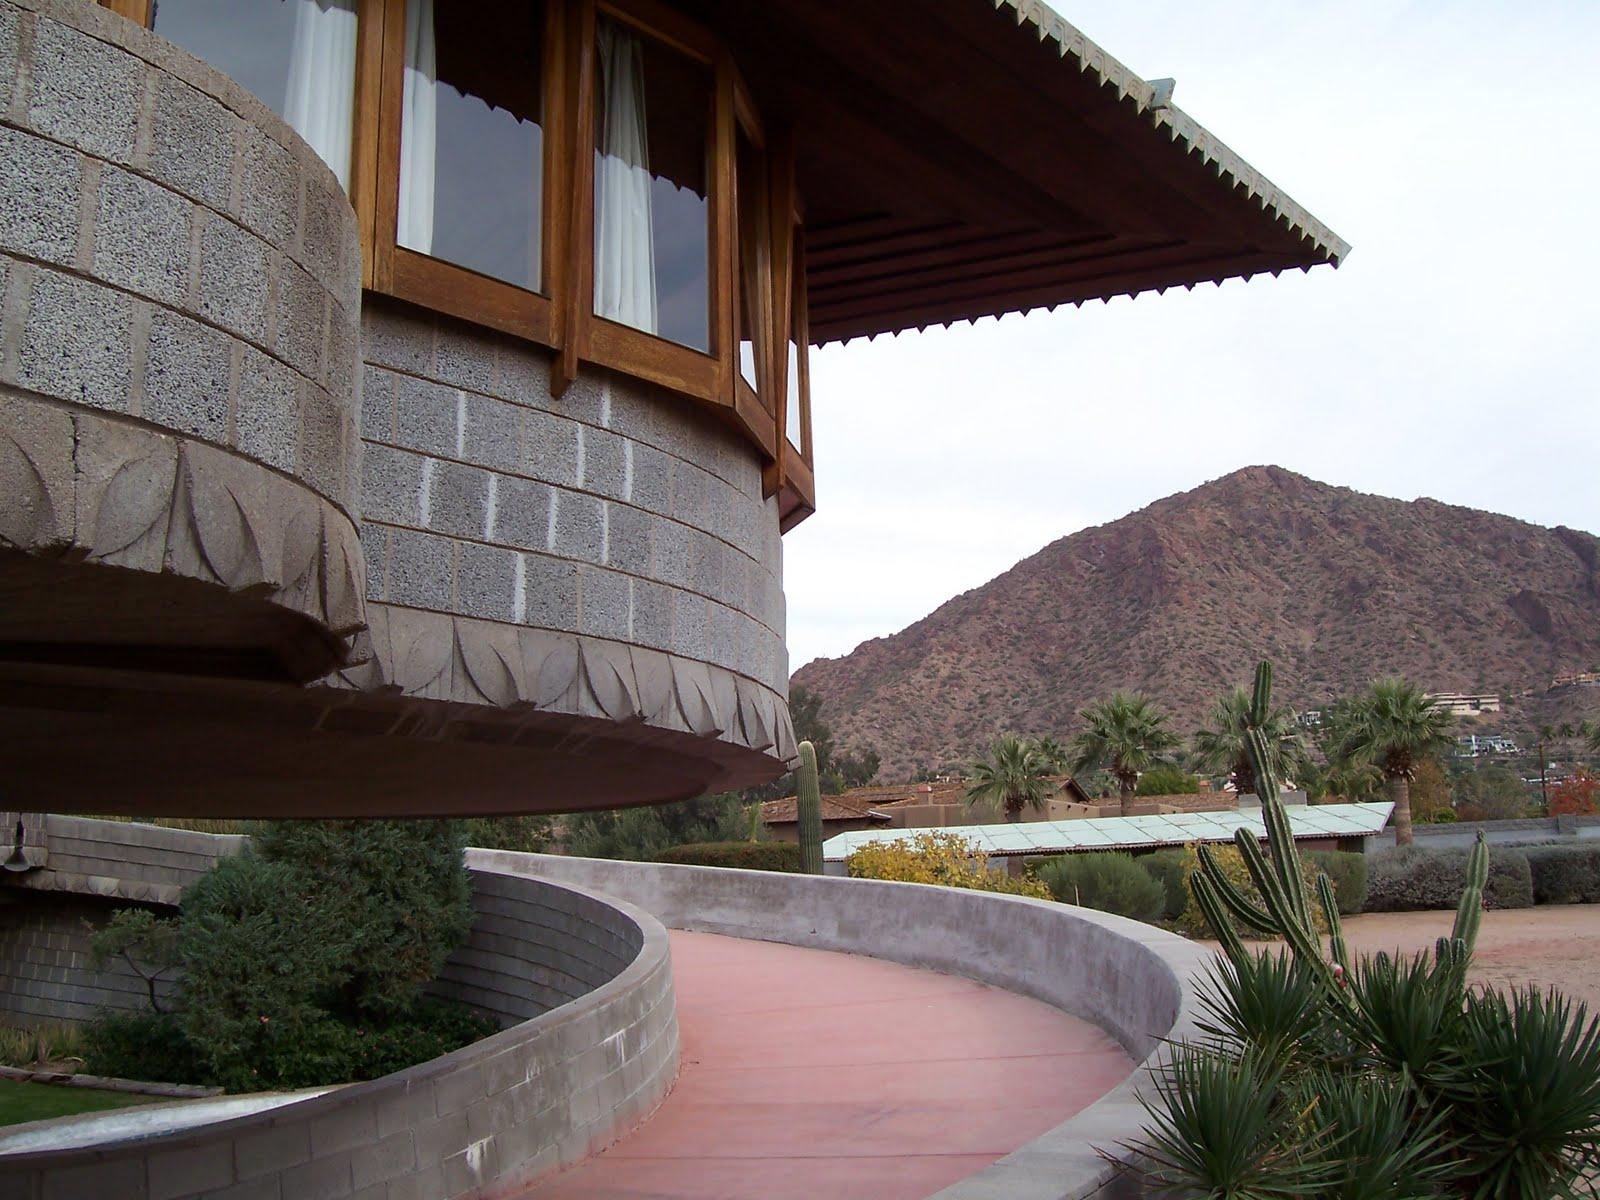 Frank-Lloyd-Wright-House-Phoenix-Arizona-2  Frank Llyod Wright House Preservation is Assured David Wright House 005